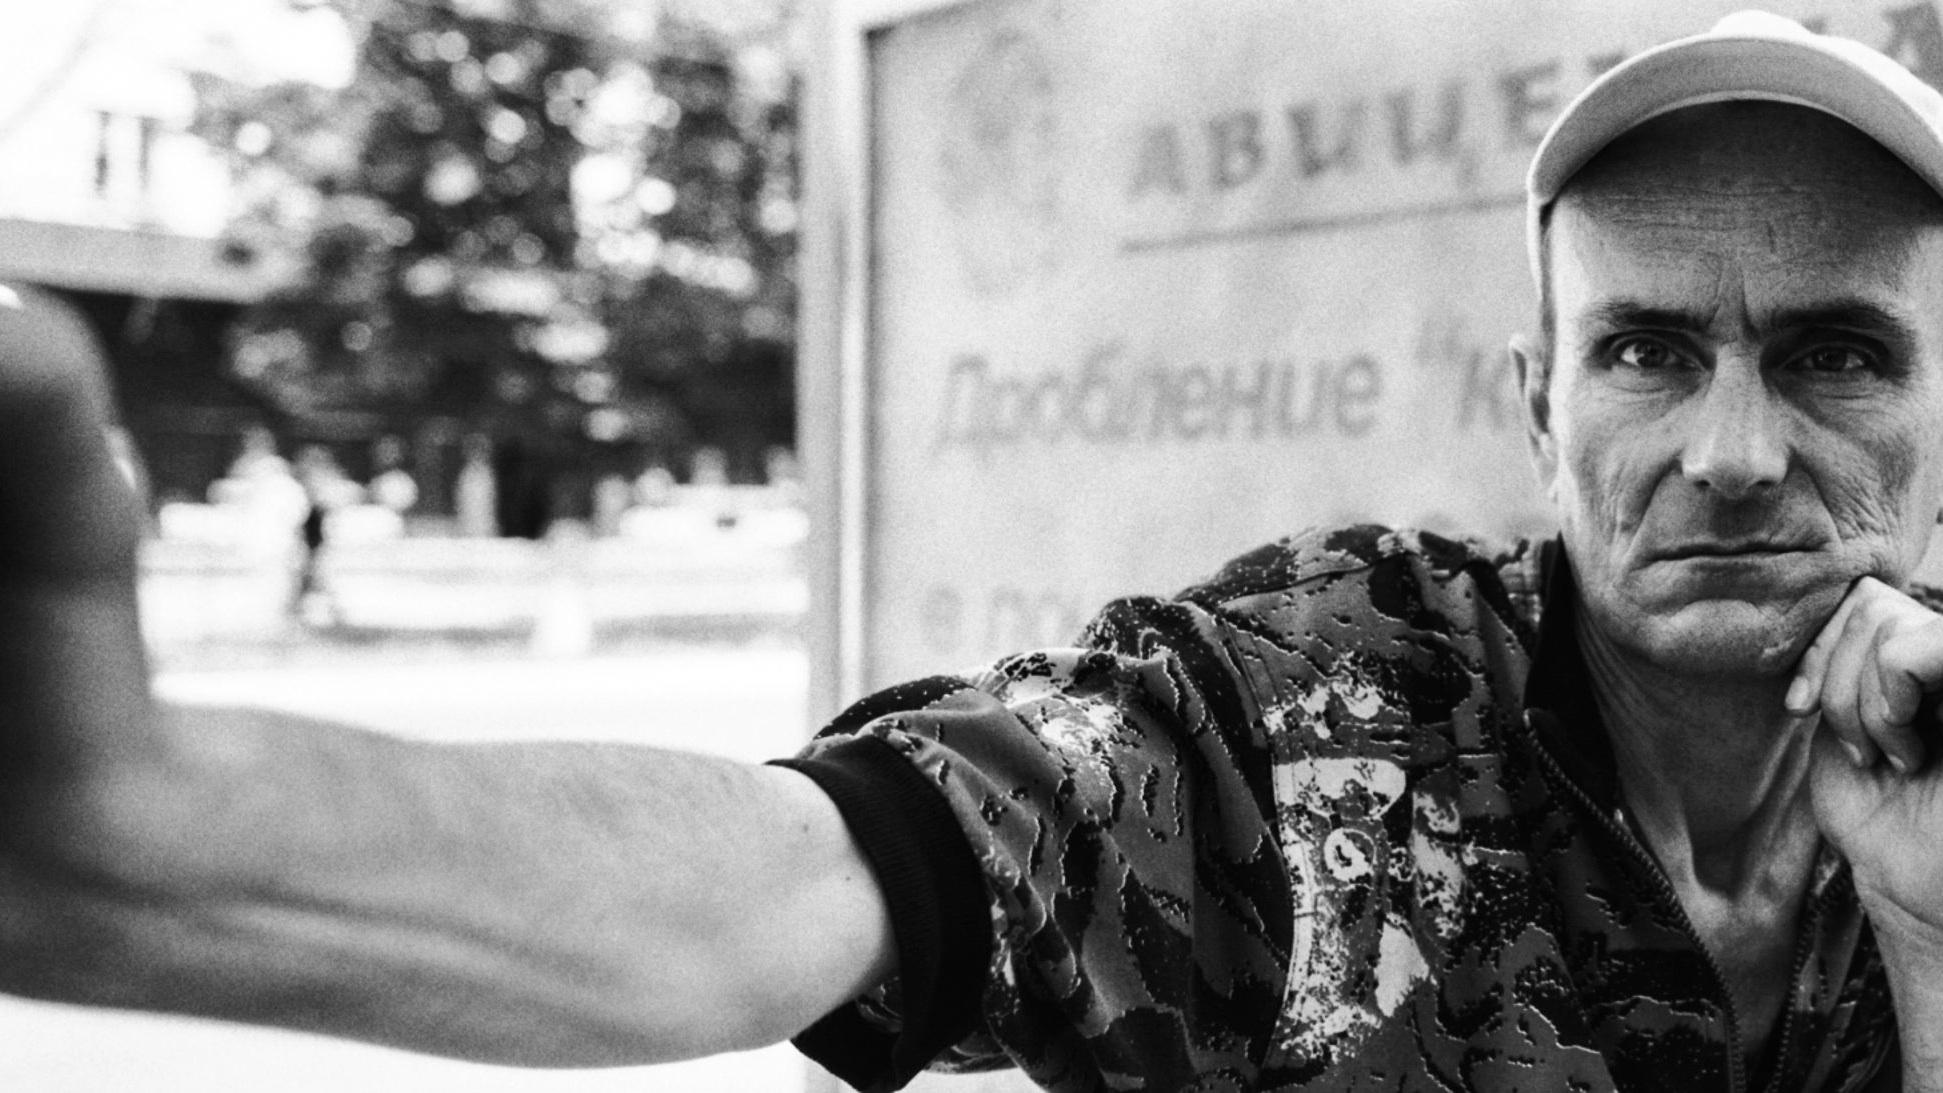 Igor, 49, a heroin addict from Simferopol